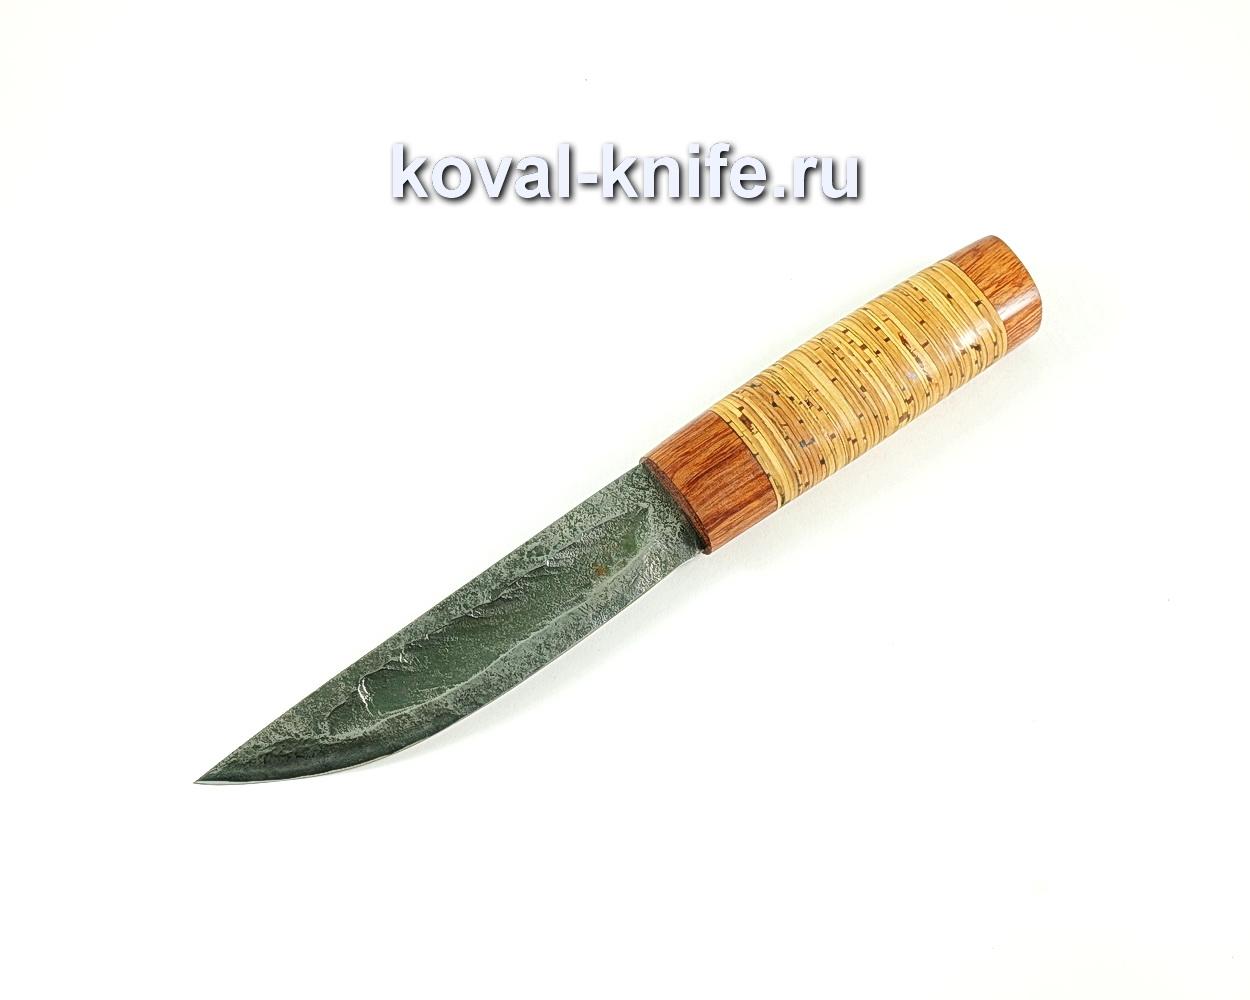 Нож Якут (сталь 9хс), рукоять бубинга, береста A133